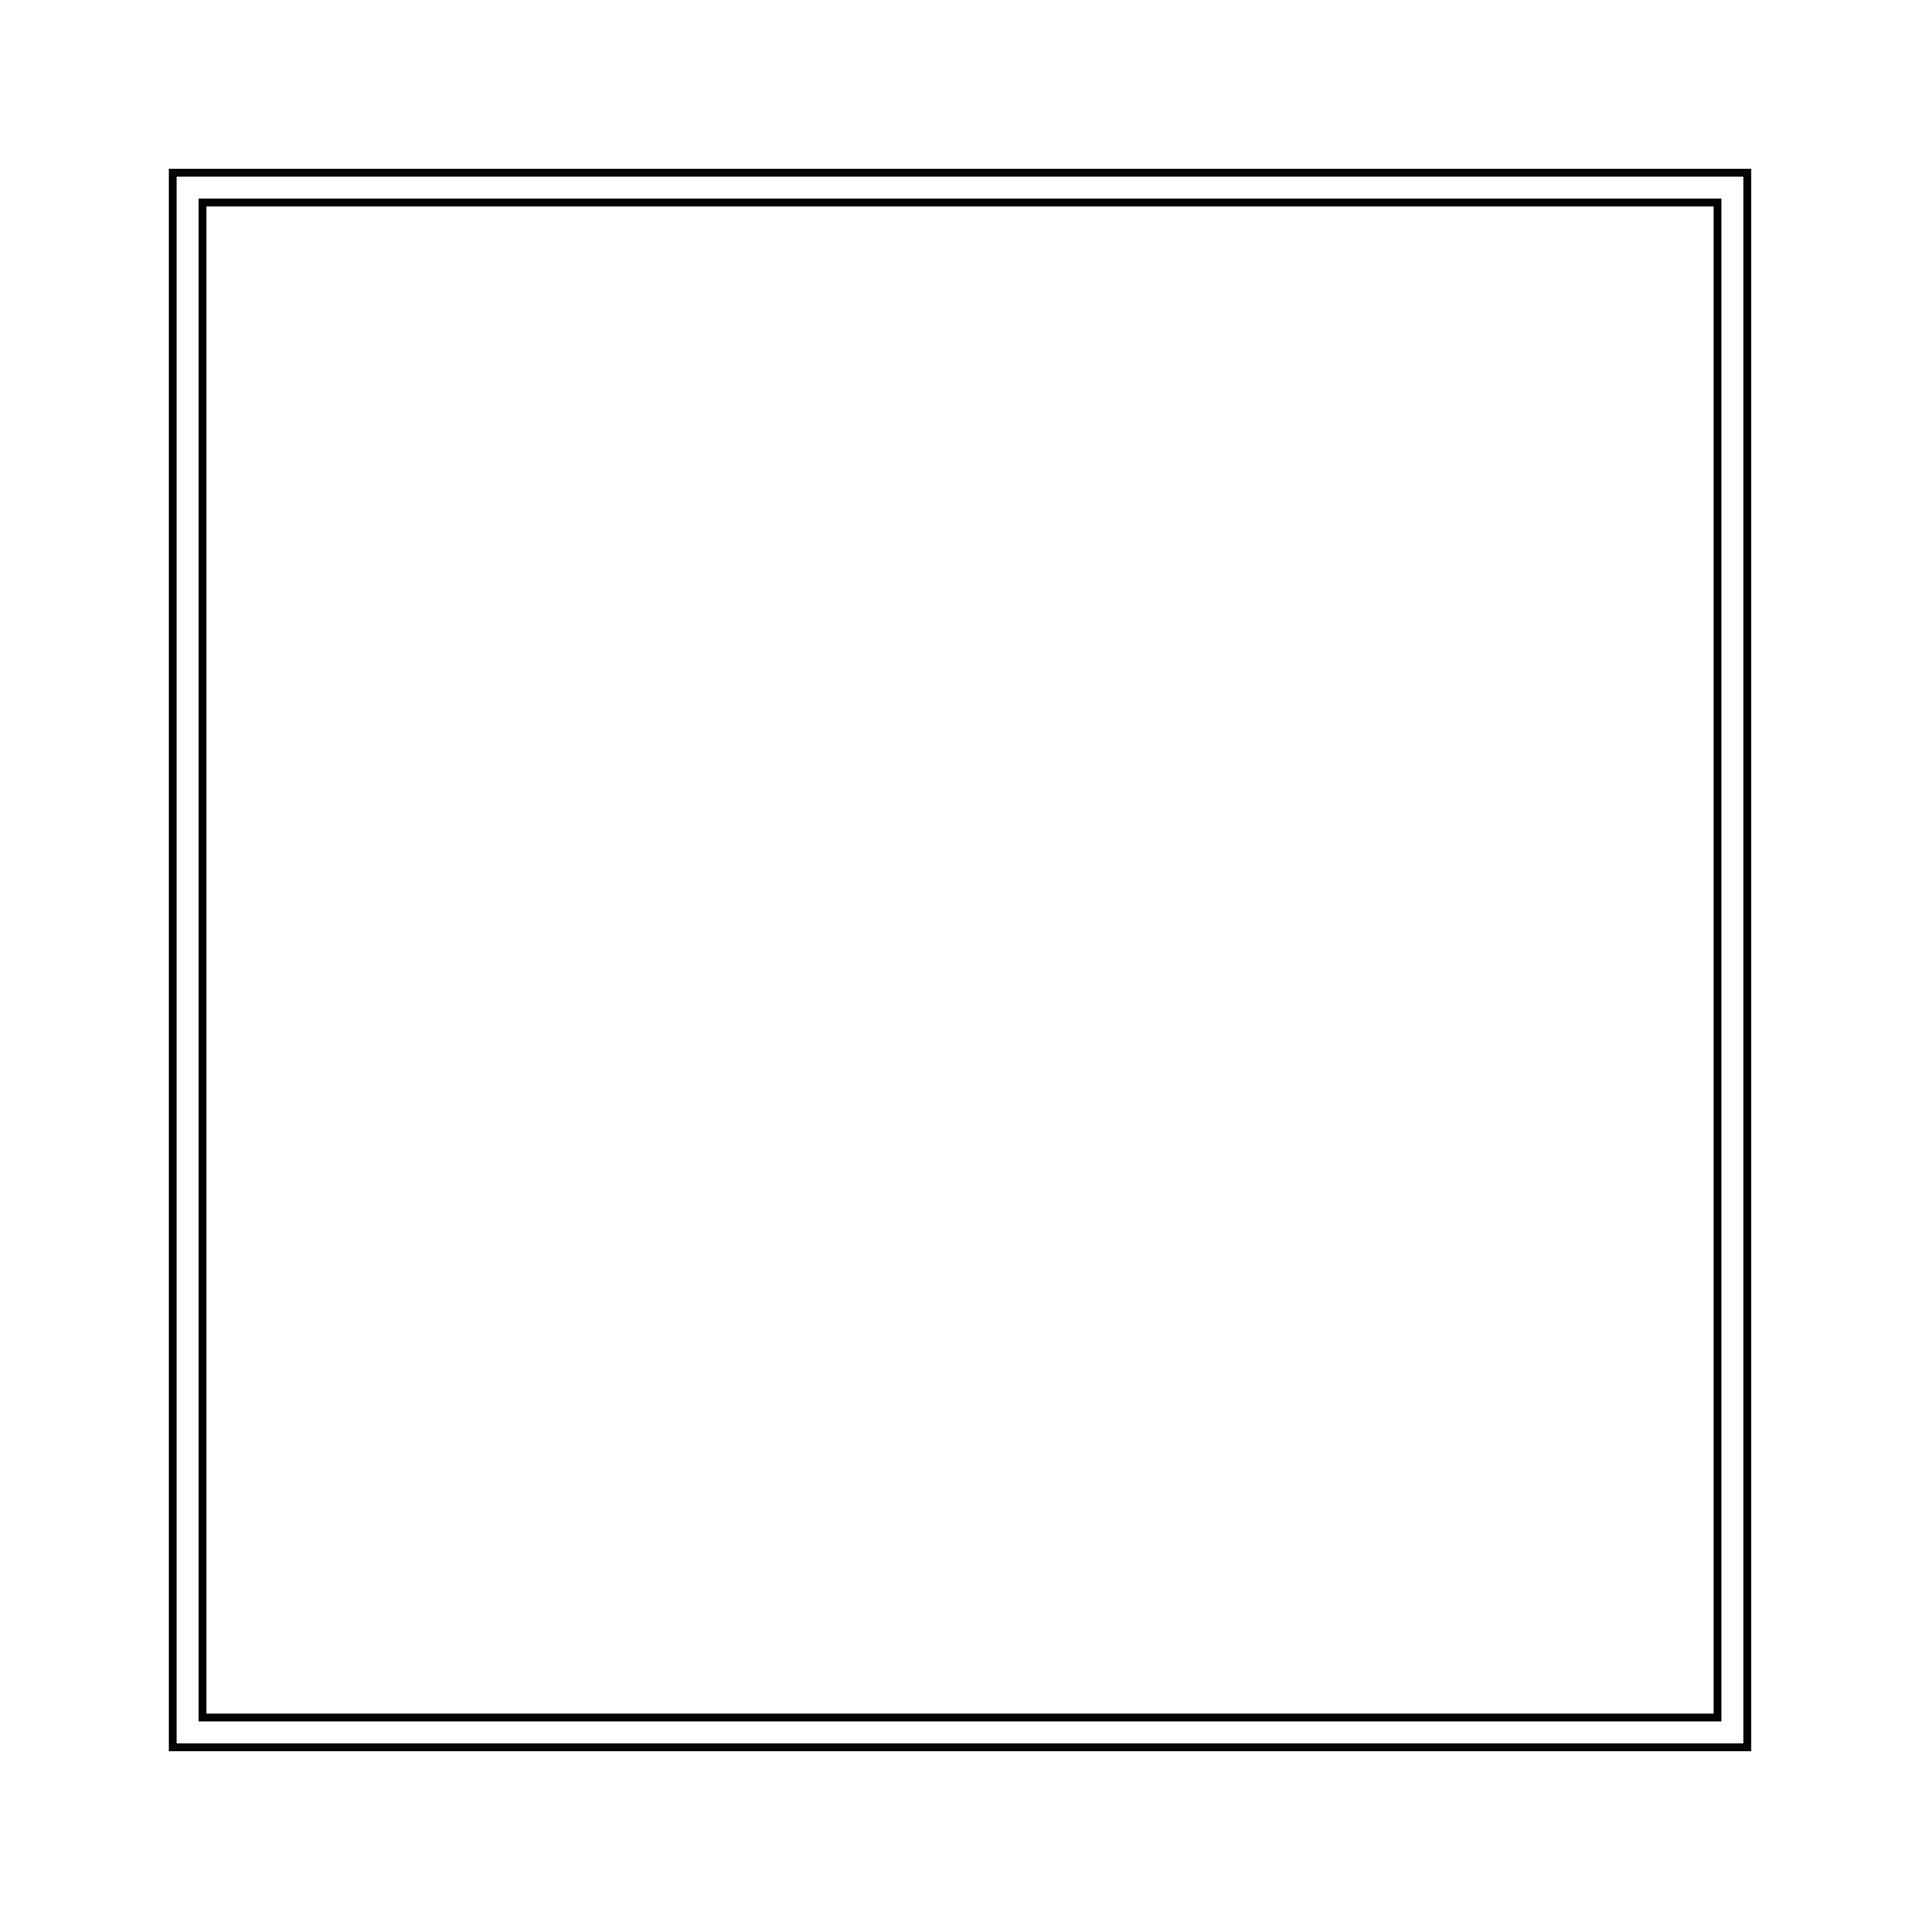 5 Inch Square Template